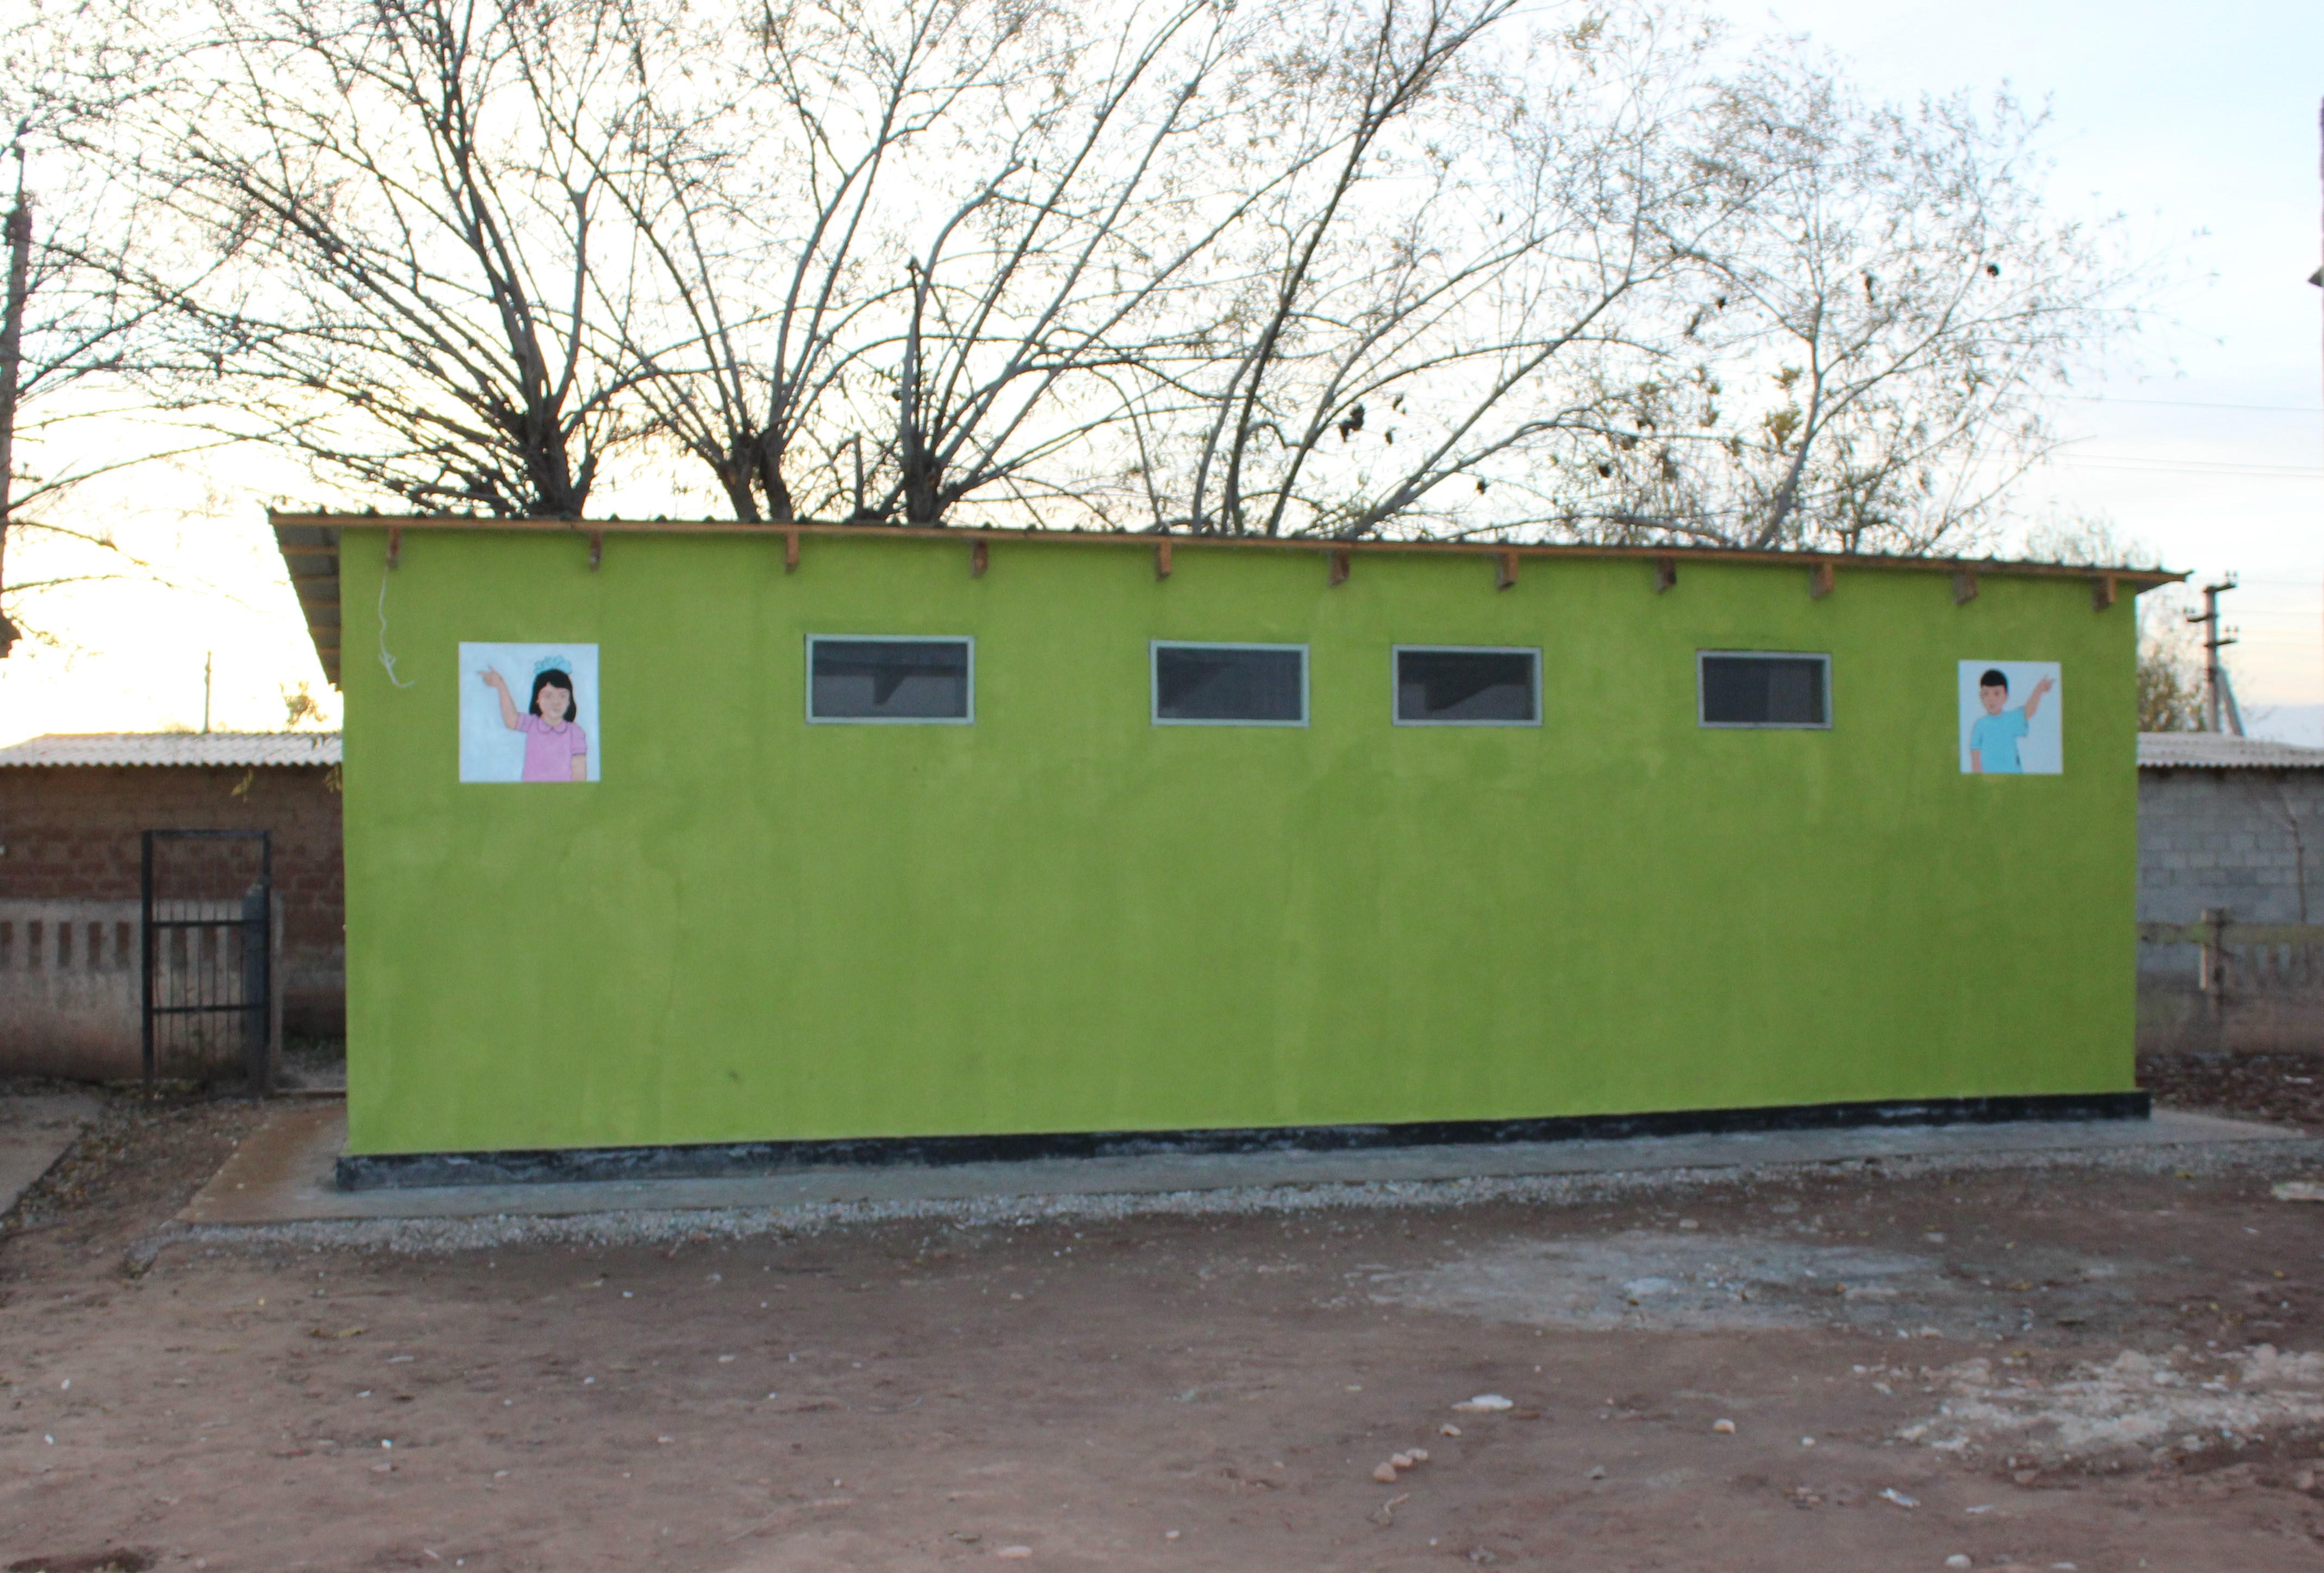 The new school latrines in Yovon district, Tajikistan. Photo byKomilova Khosiyatkhon for IntraHealth International.